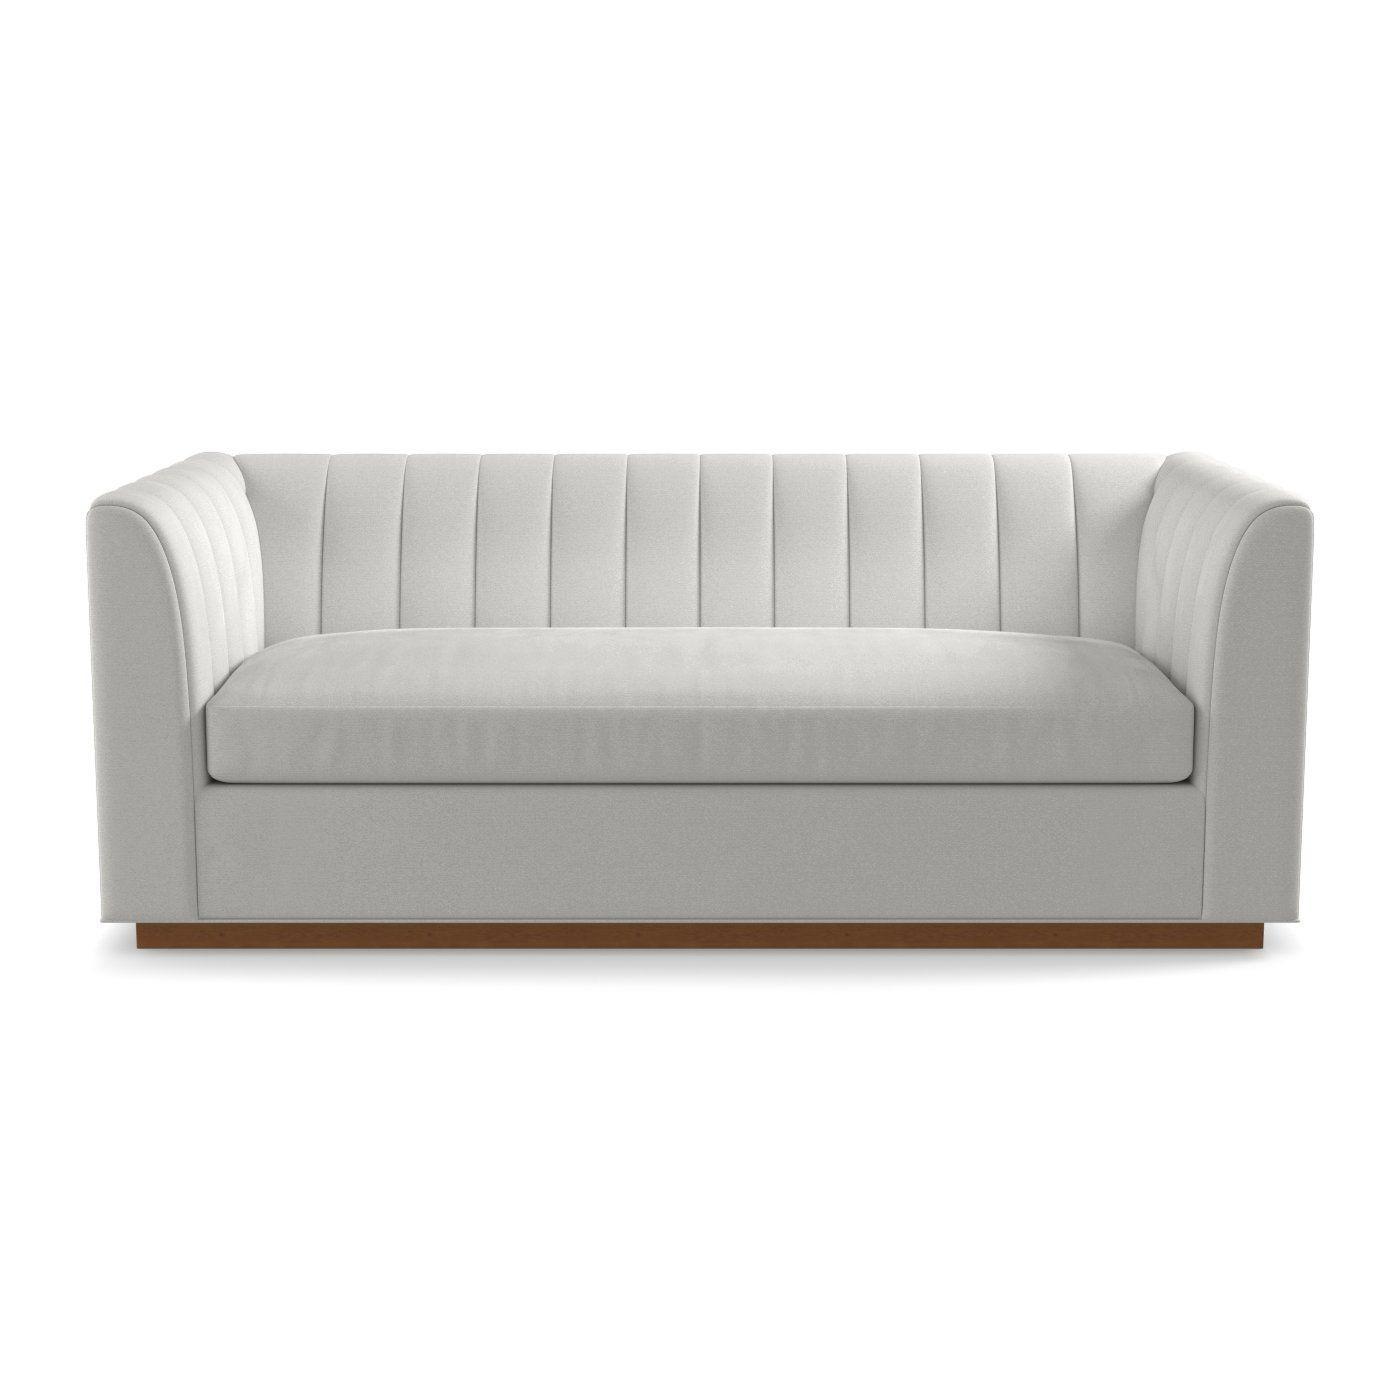 Tremendous This Sleek And Oversized Sleeper Sofa Has A Tight Channel Customarchery Wood Chair Design Ideas Customarcherynet